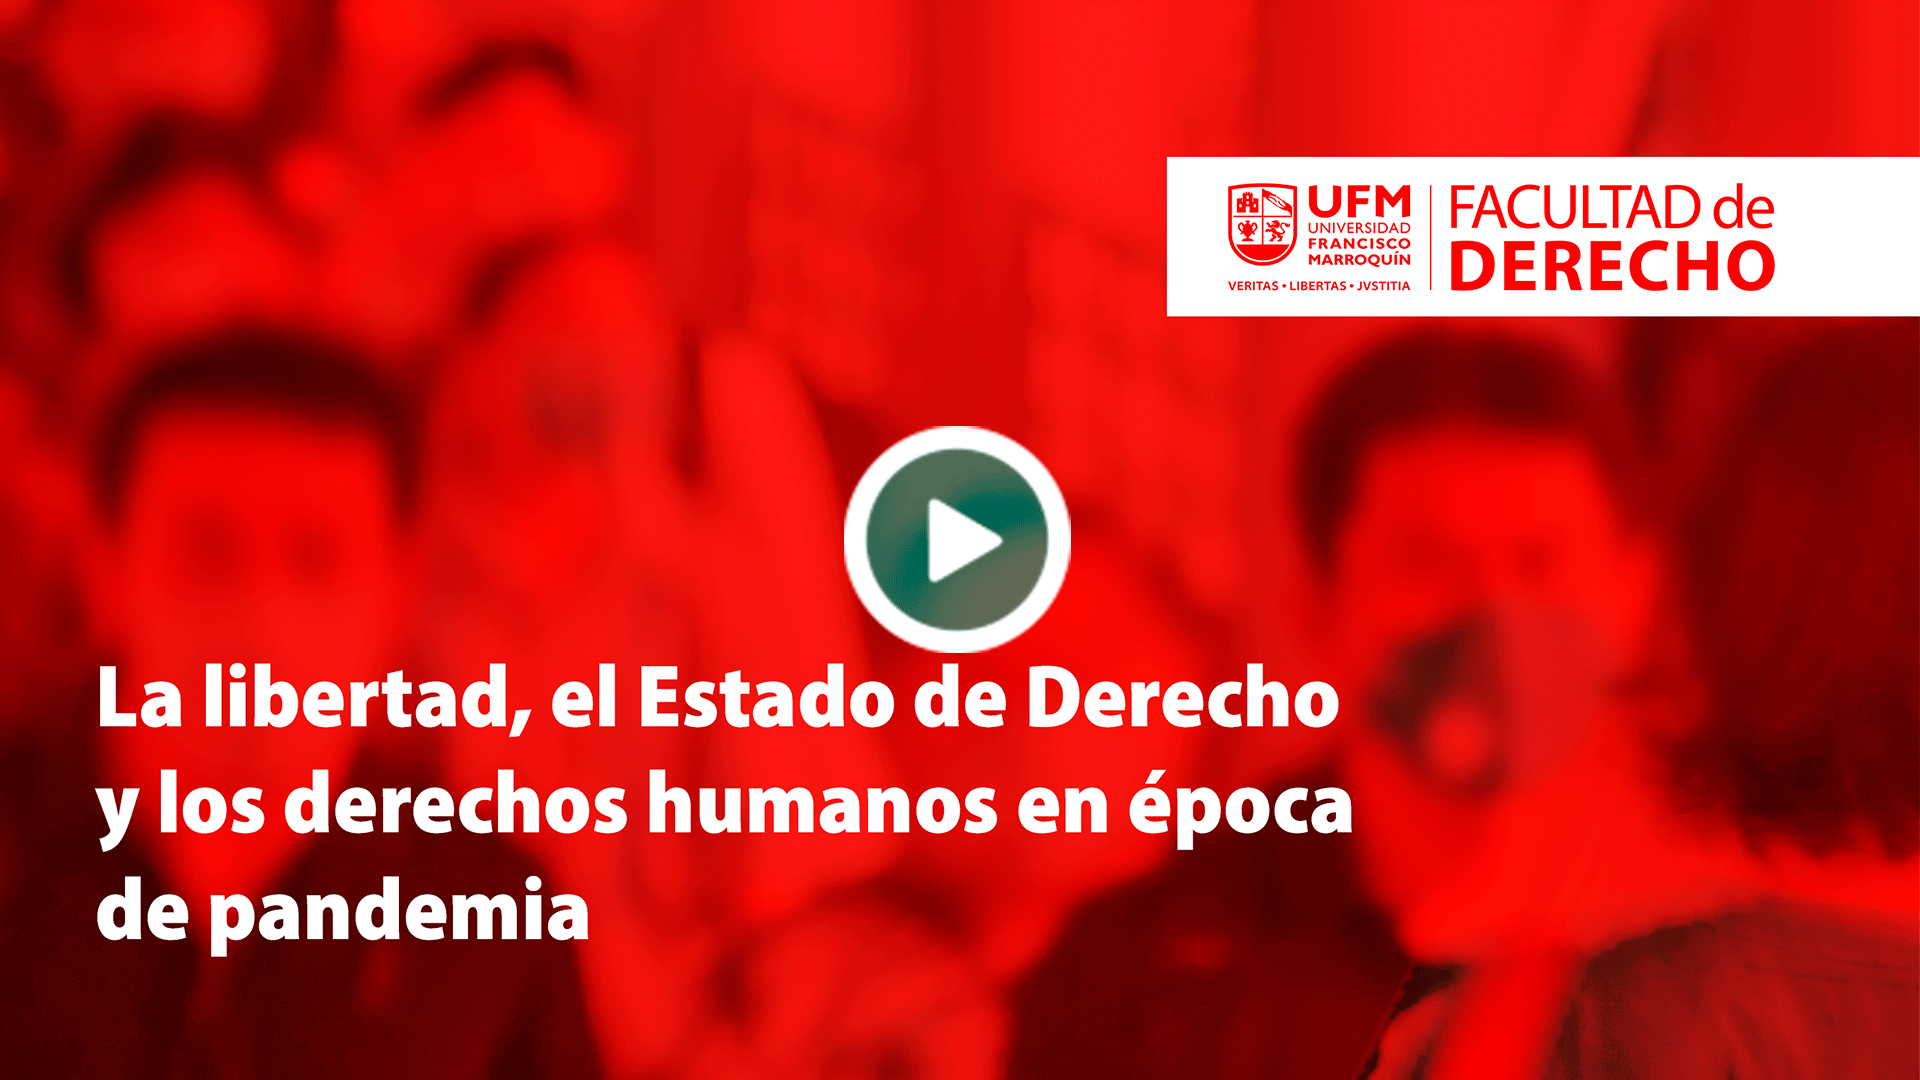 20200707_webinarderecho1_Derecho-webinar-2